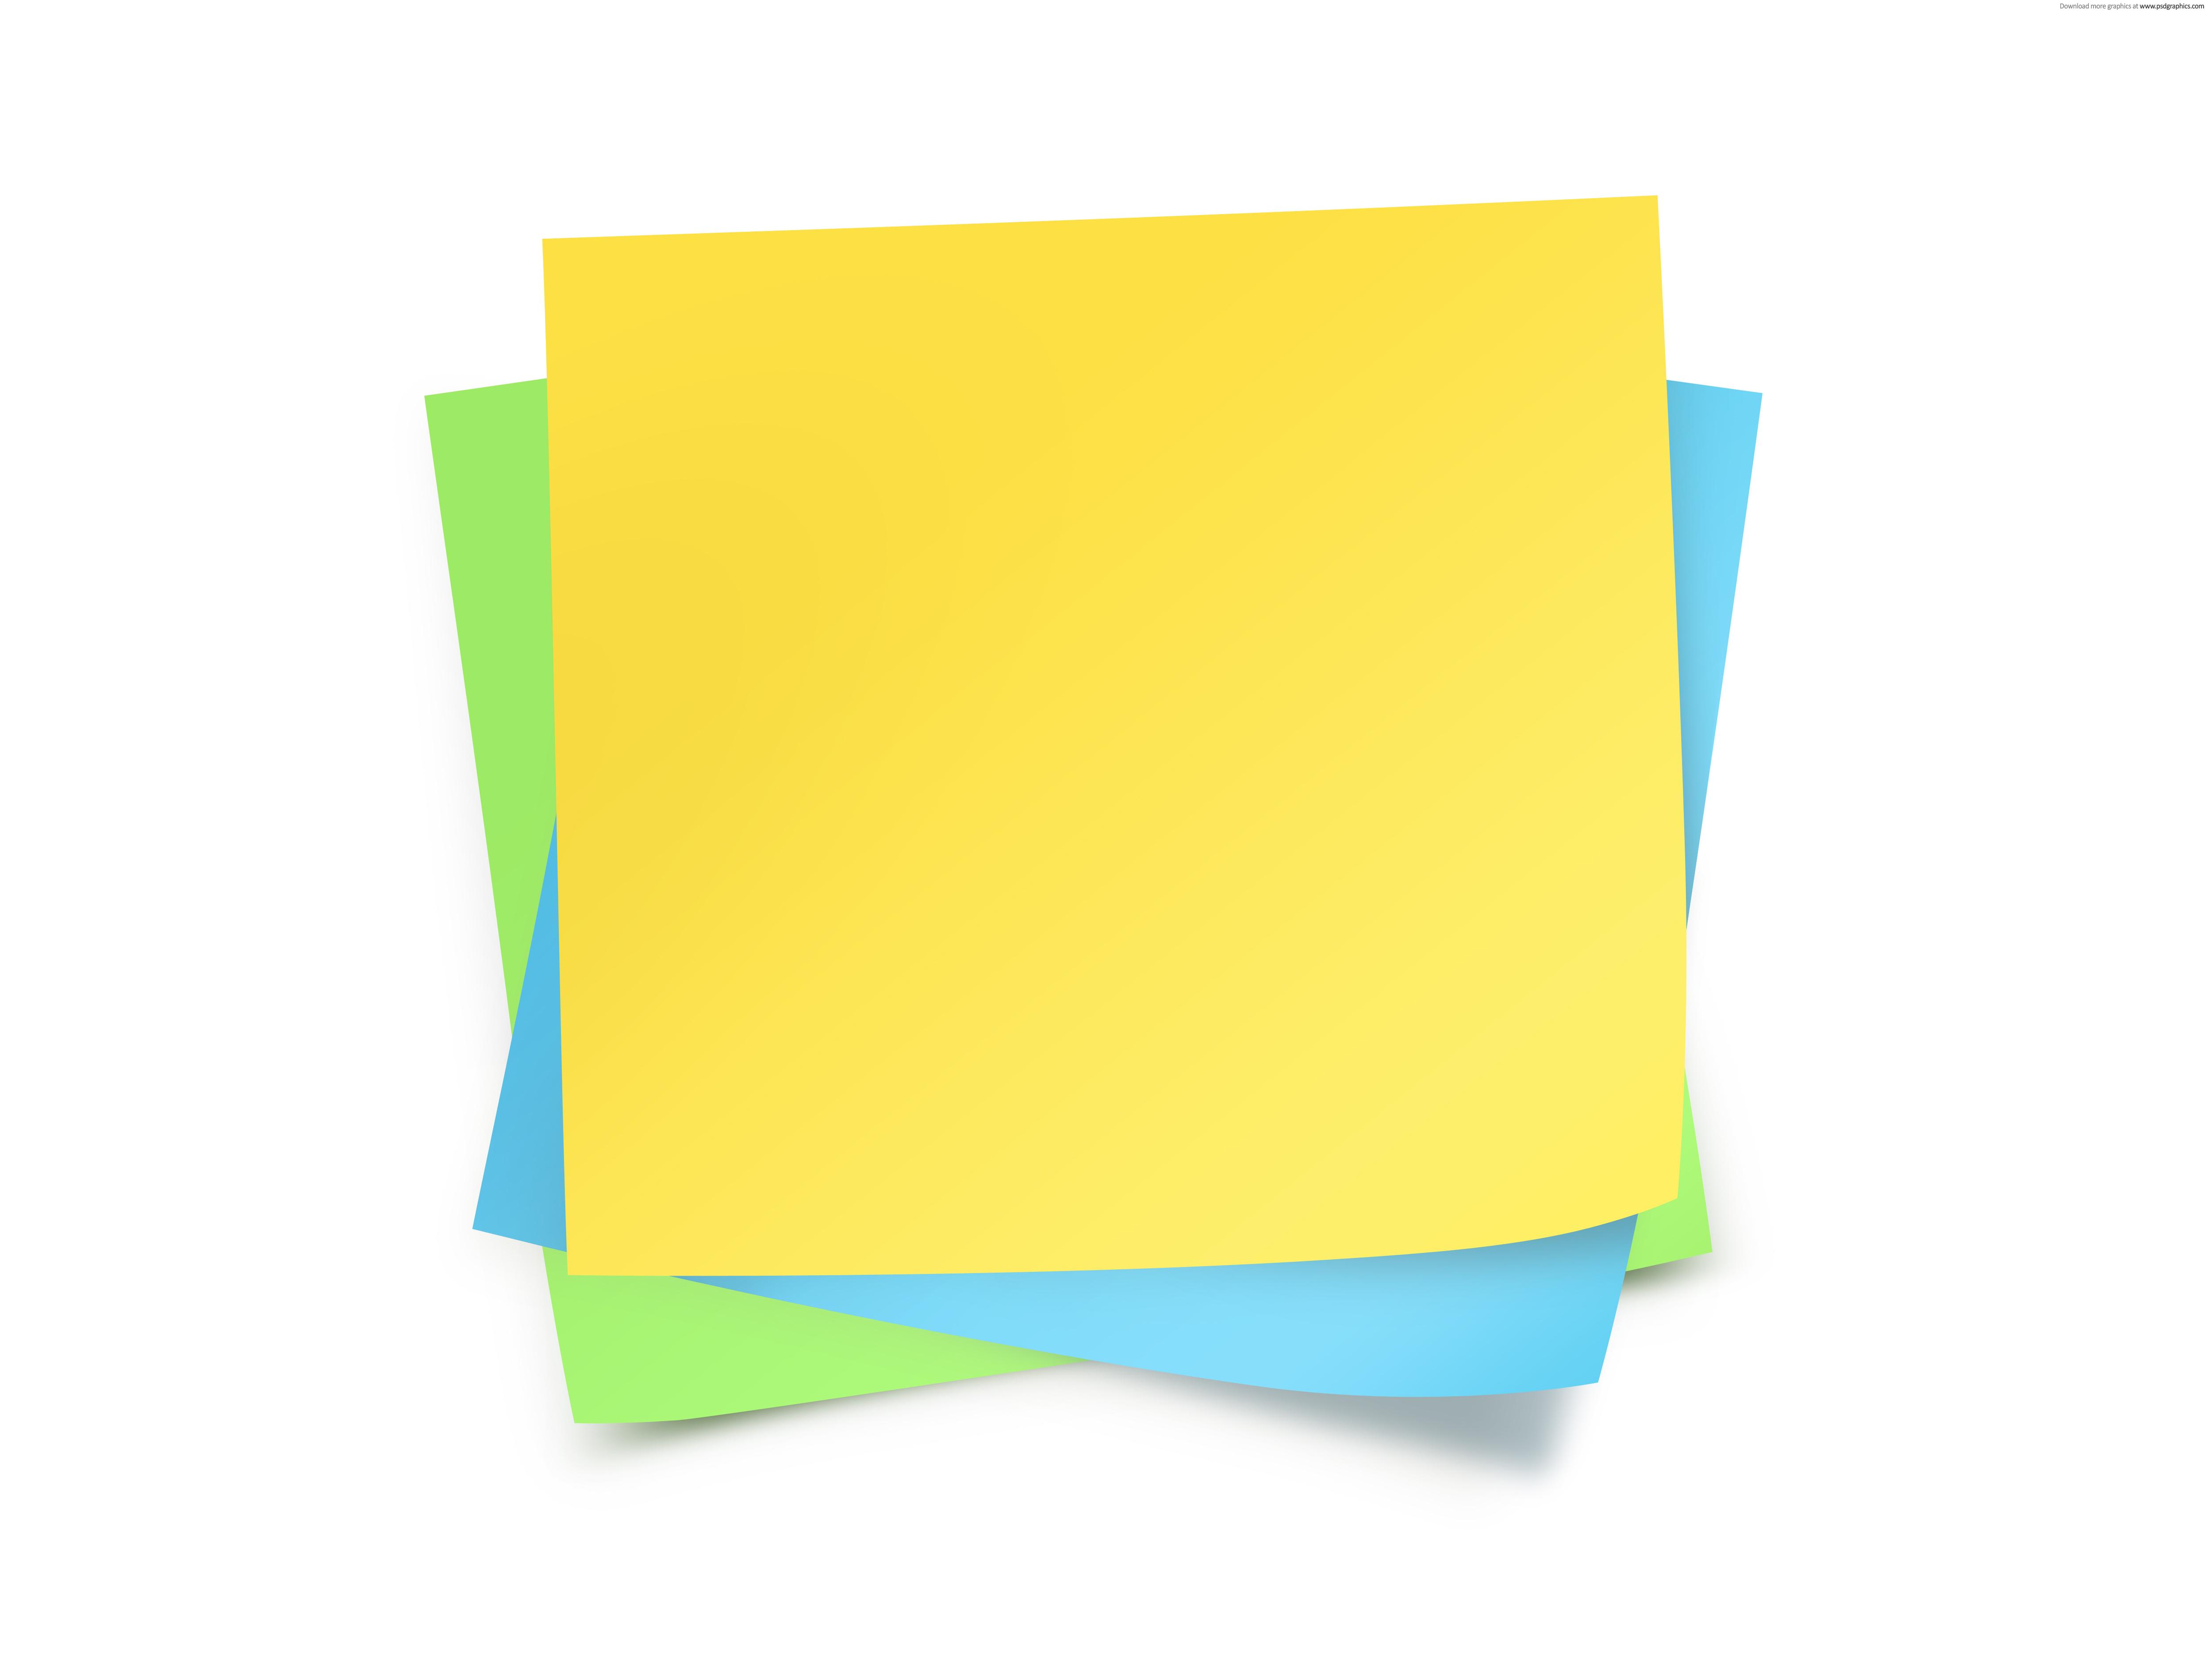 Blank Sticky Note - ClipArt Best